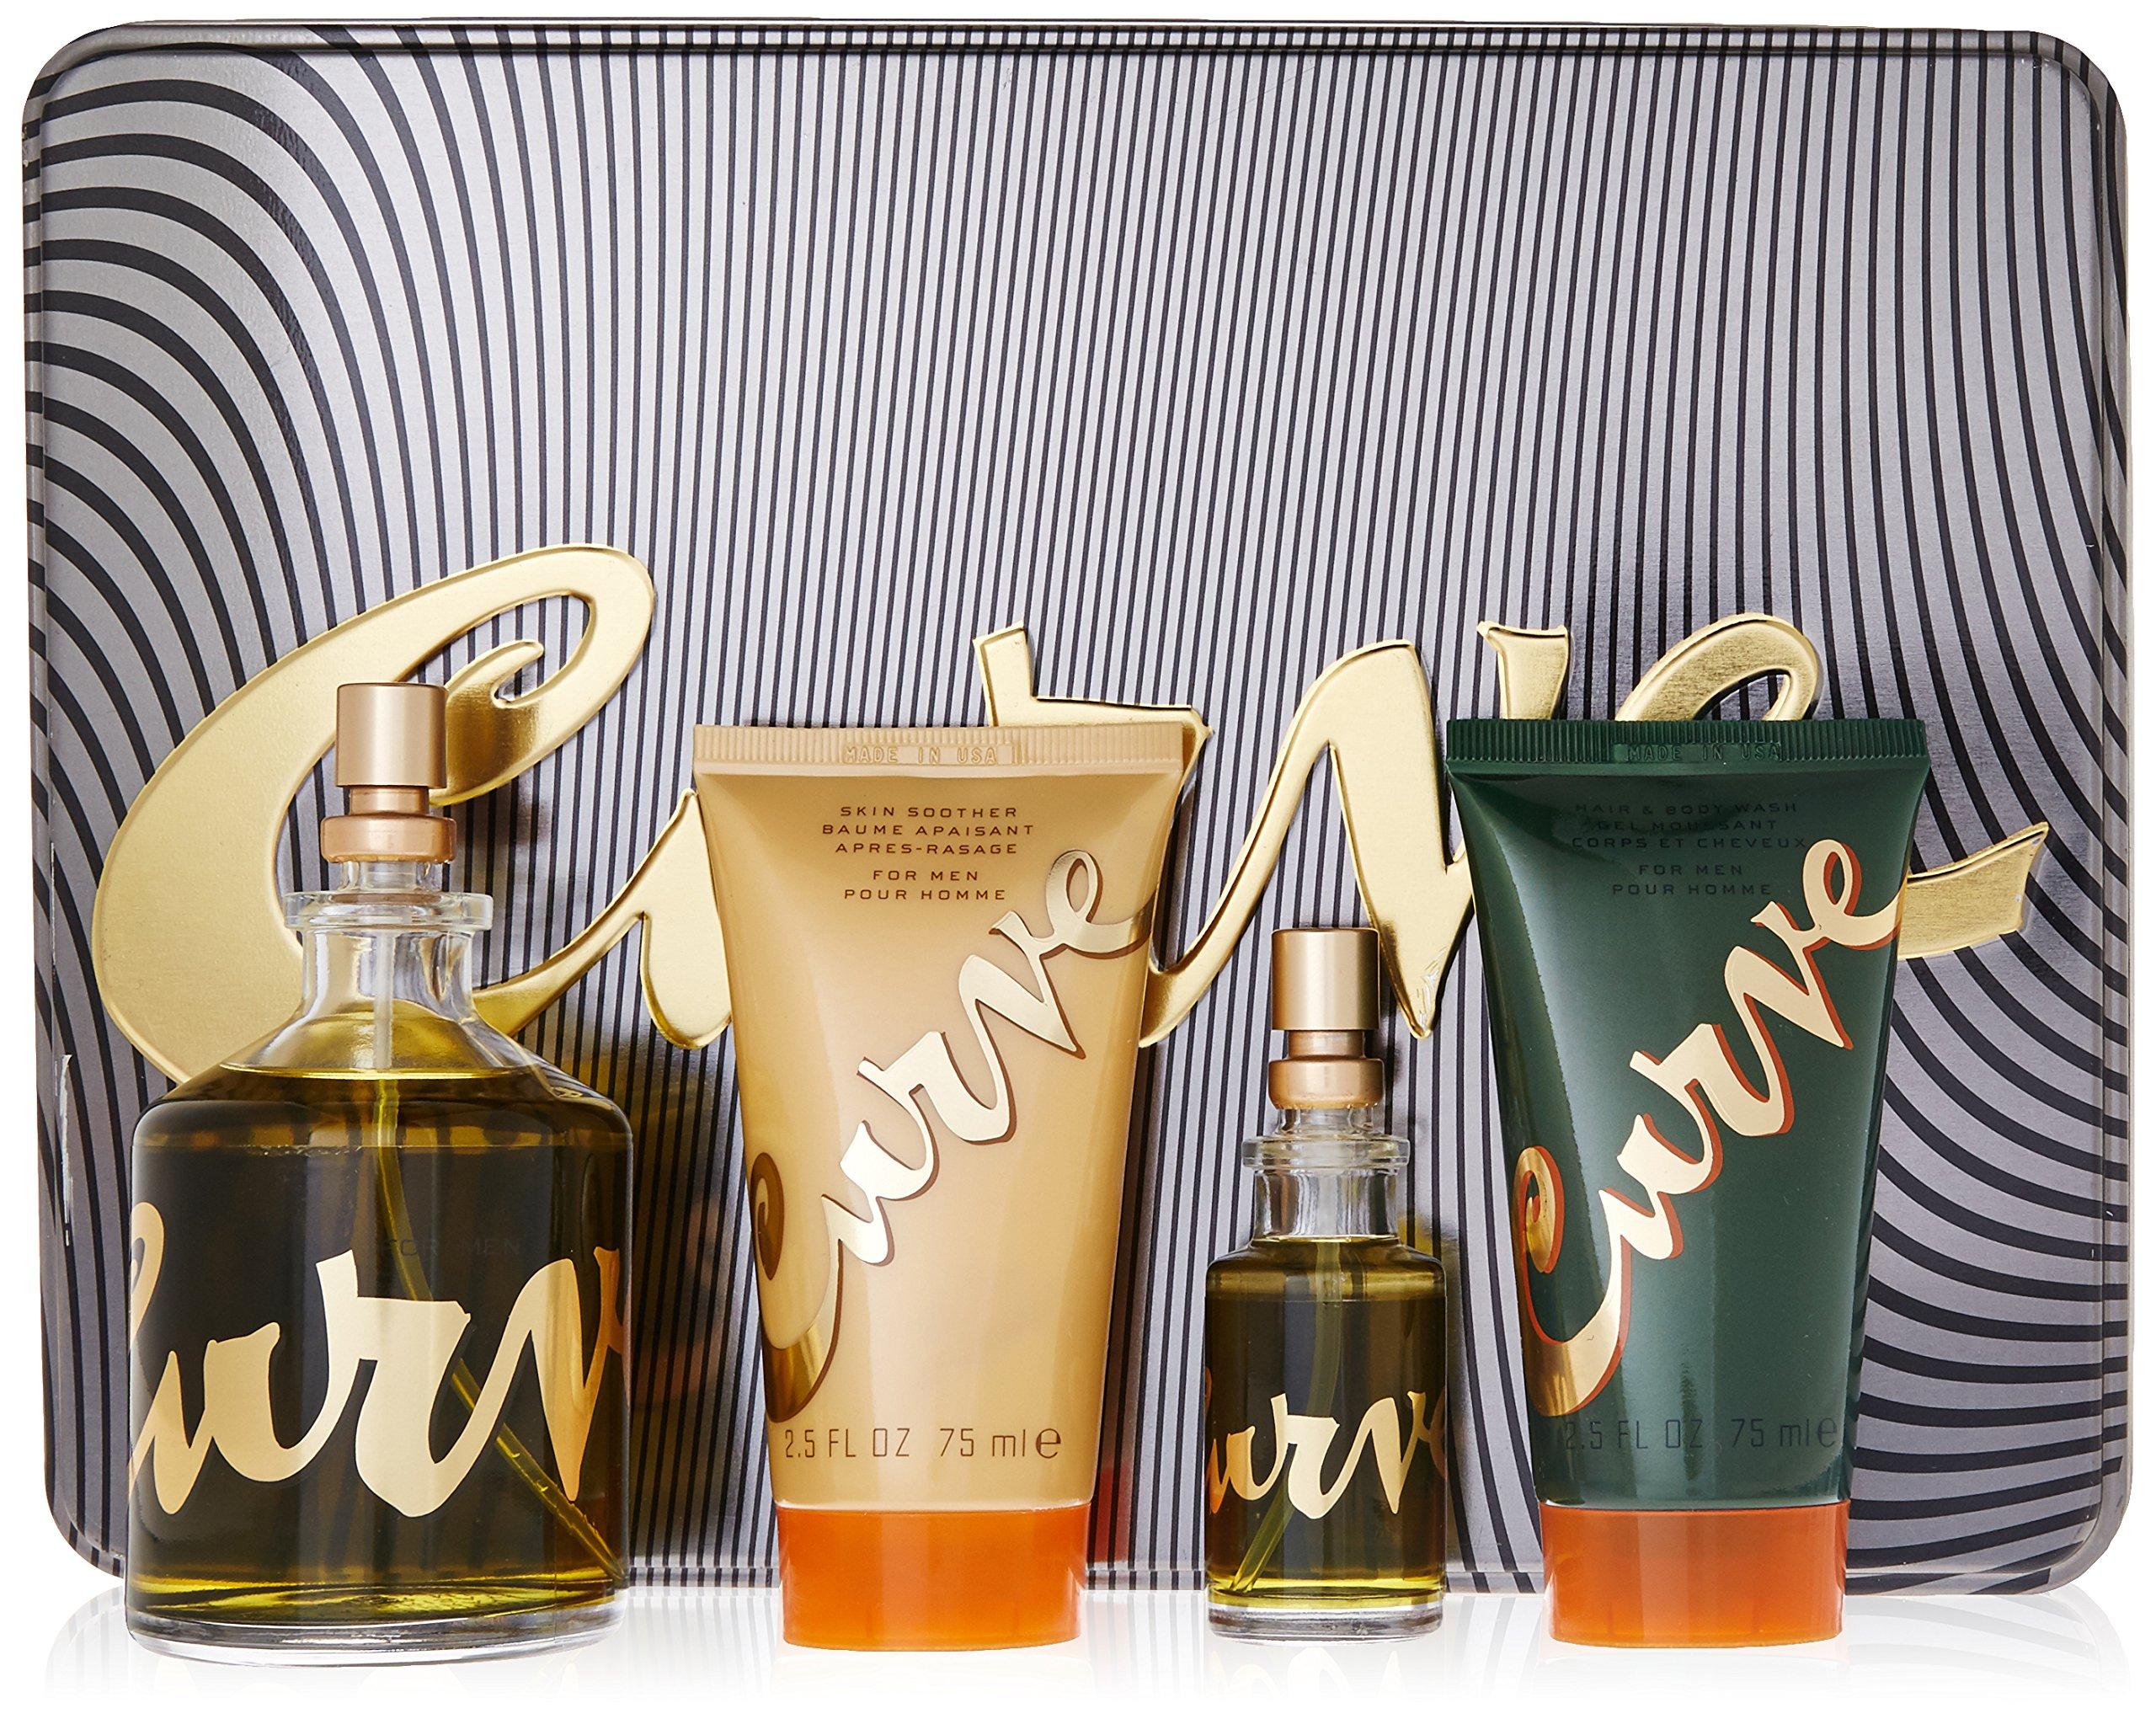 Liz Claiborne Curve Men Gift Set (Spray, Skin Soother, Hair and Body Wash) by Liz Claiborne